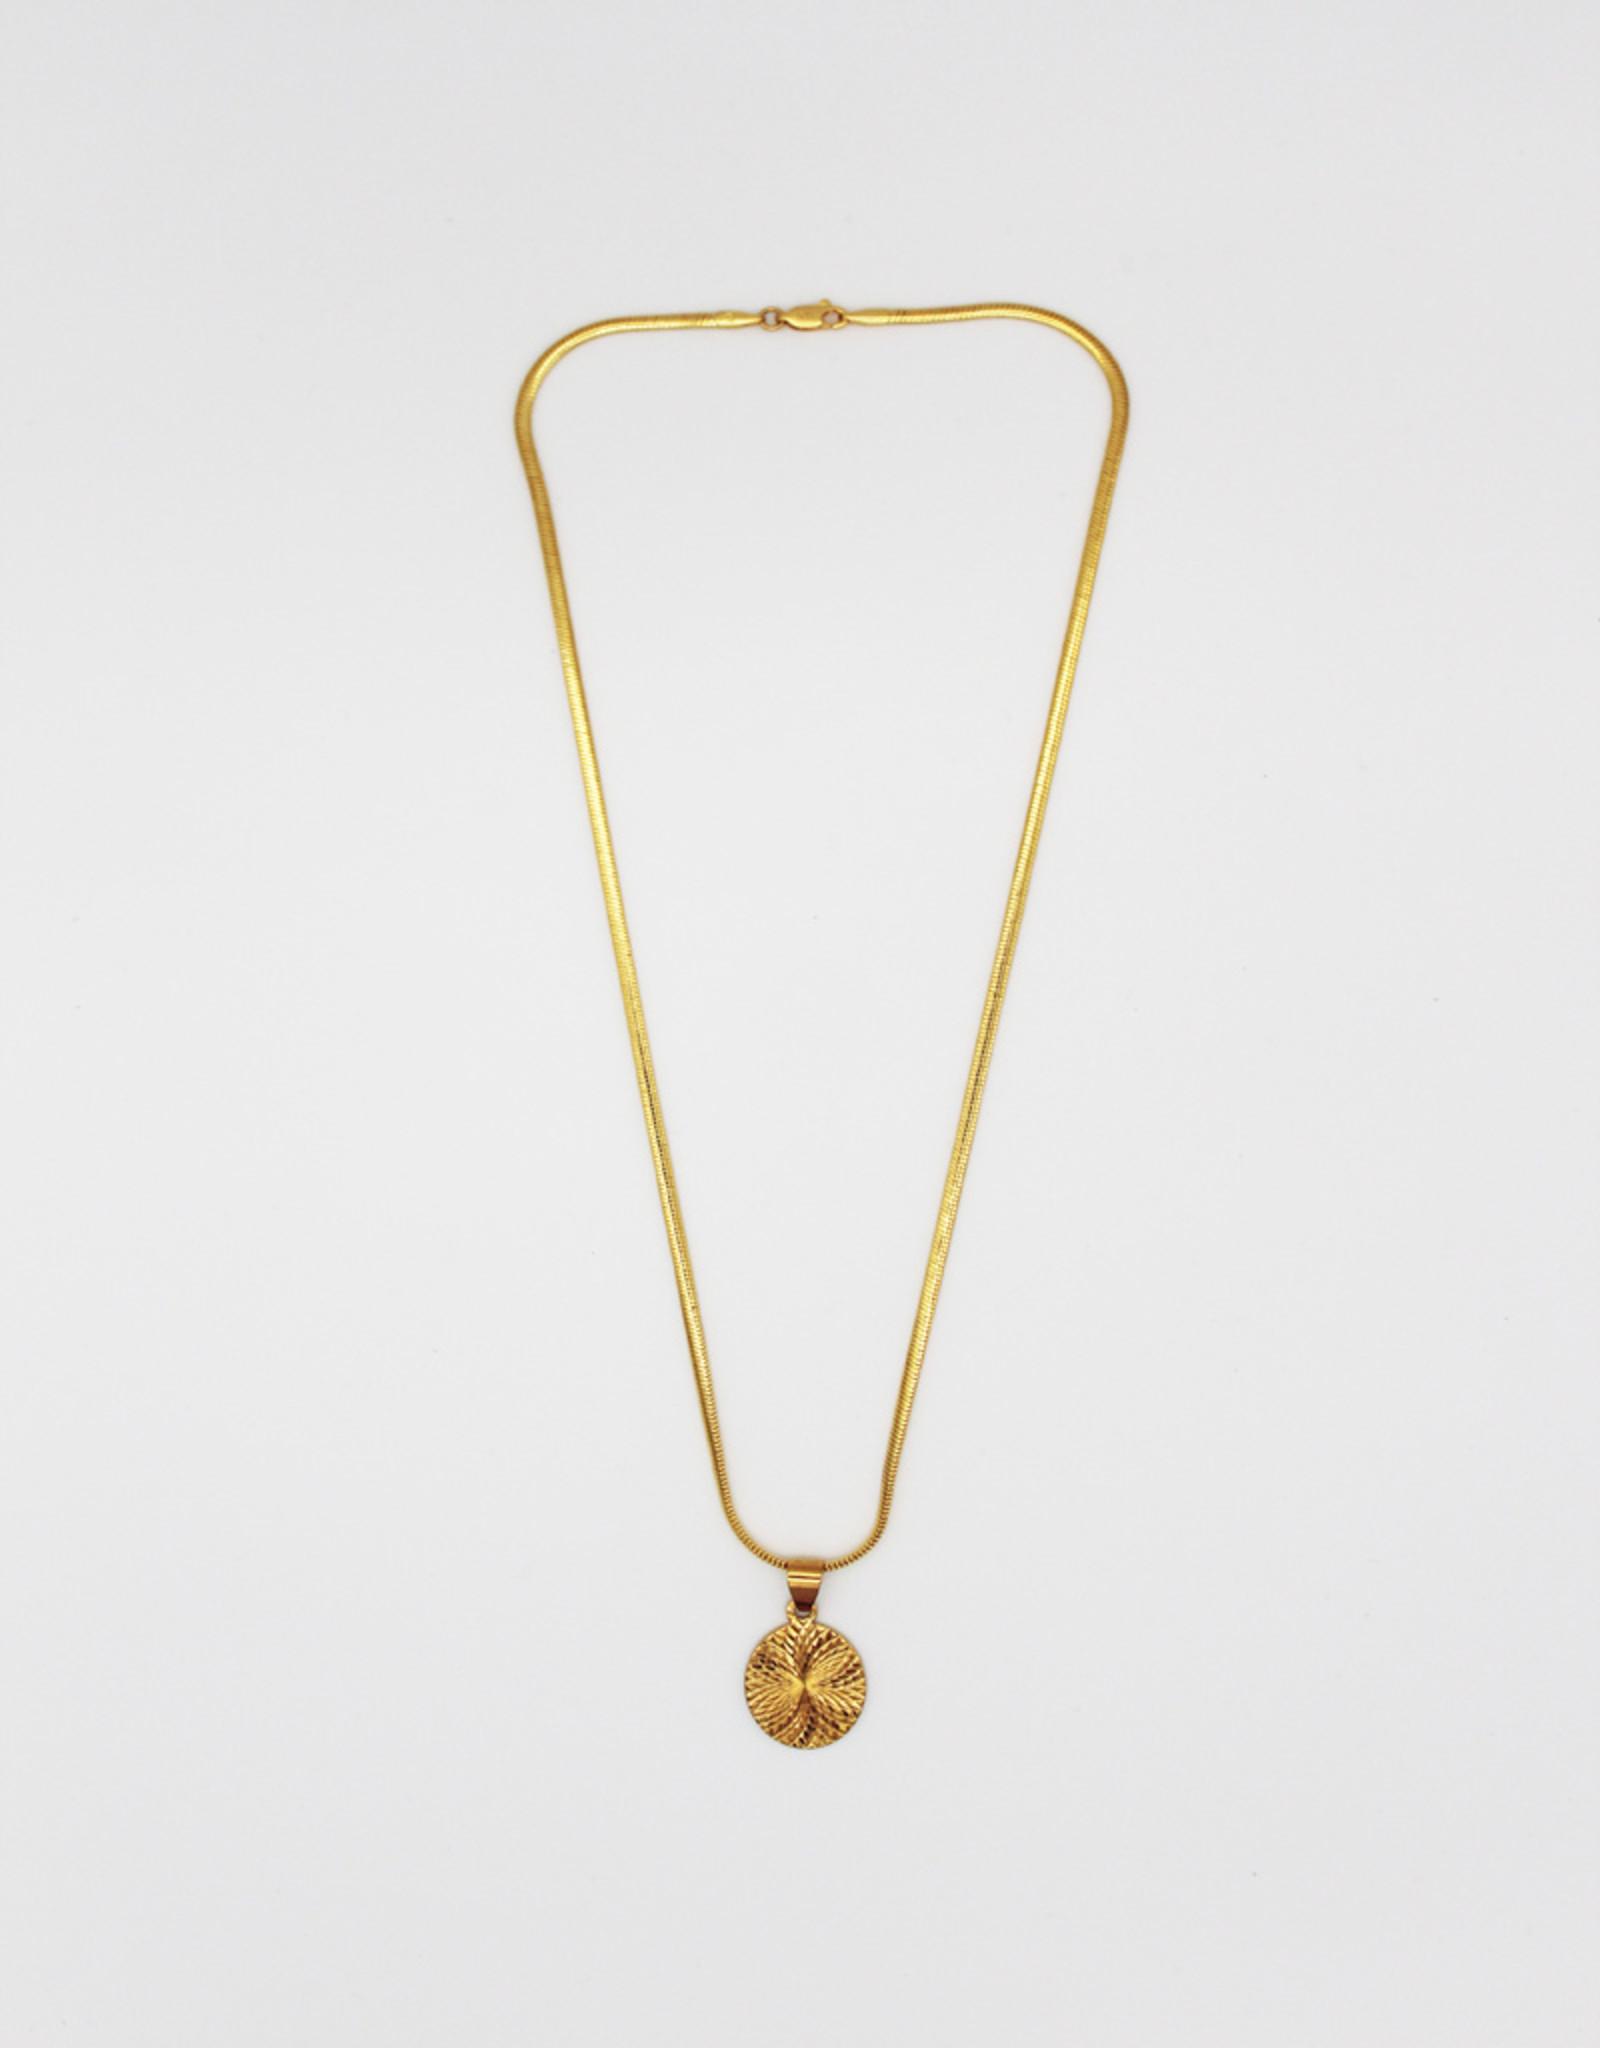 Madison Richey MR17 Circle Gold Filled Pendant